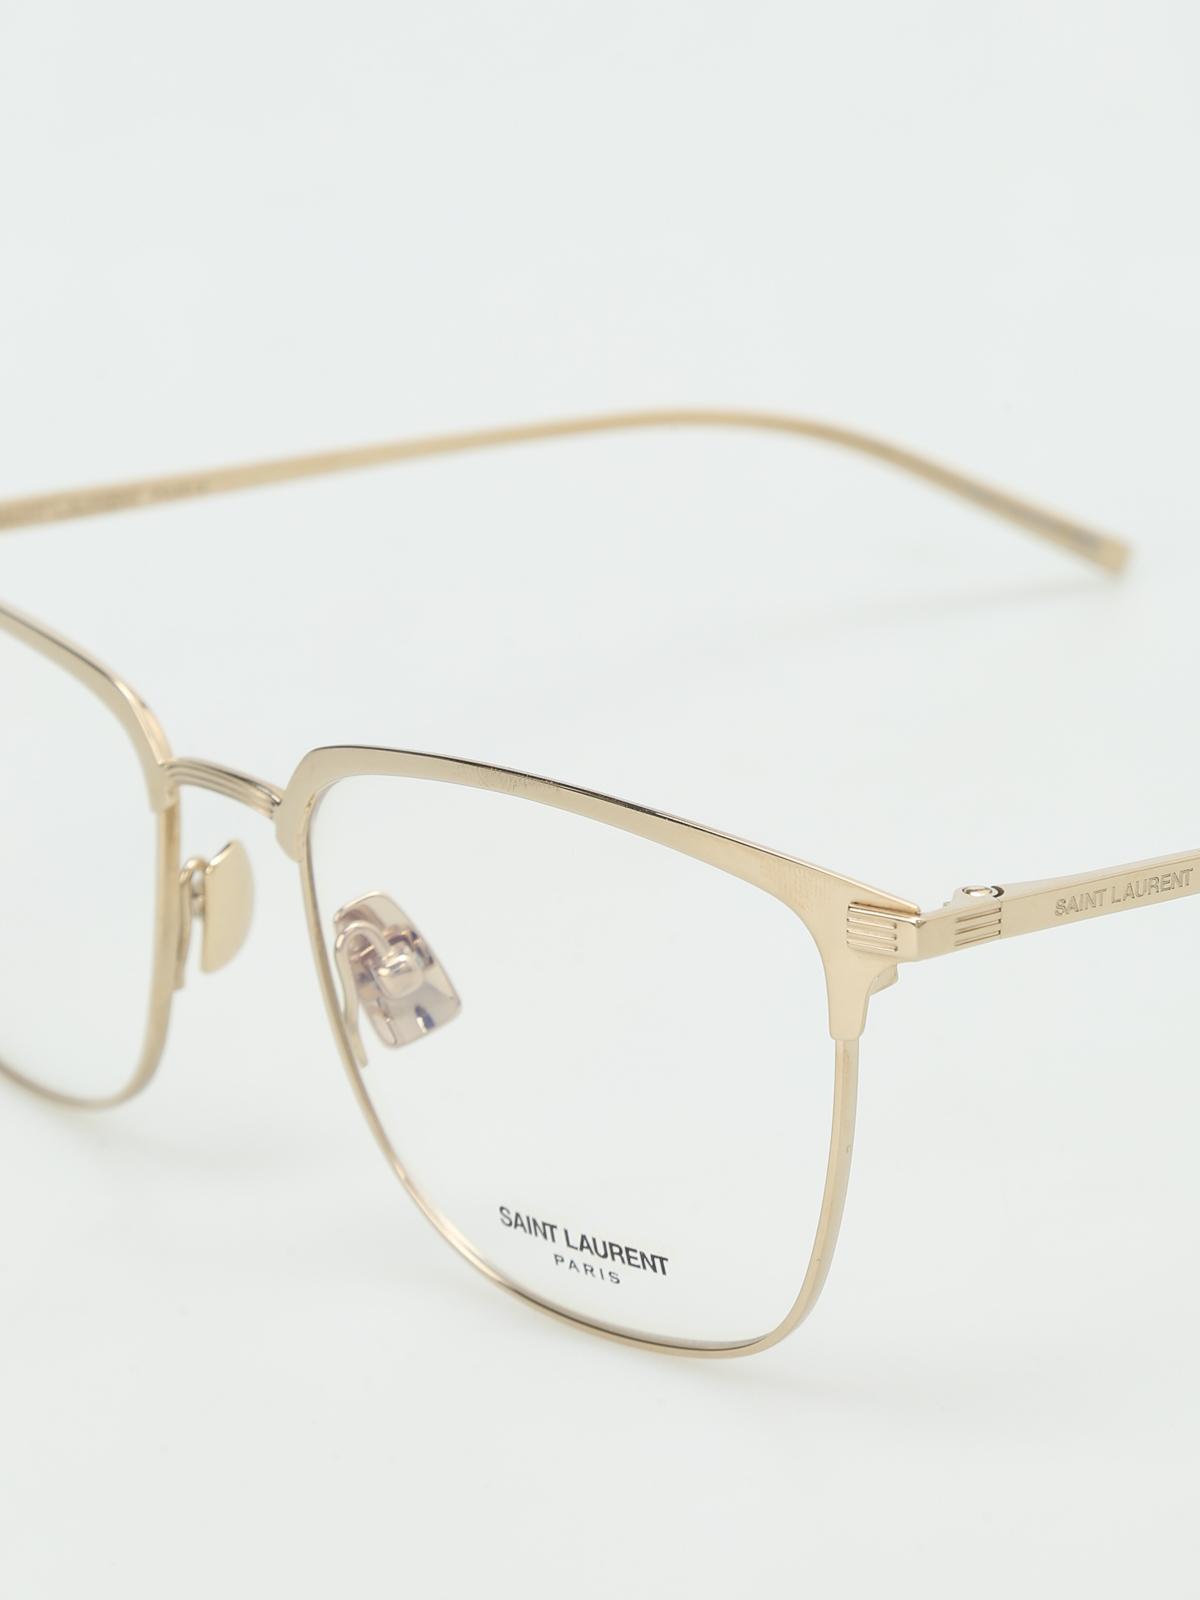 c0541ddfda Saint Laurent - Gold tone titanium optical glasses - glasses - SL151T002